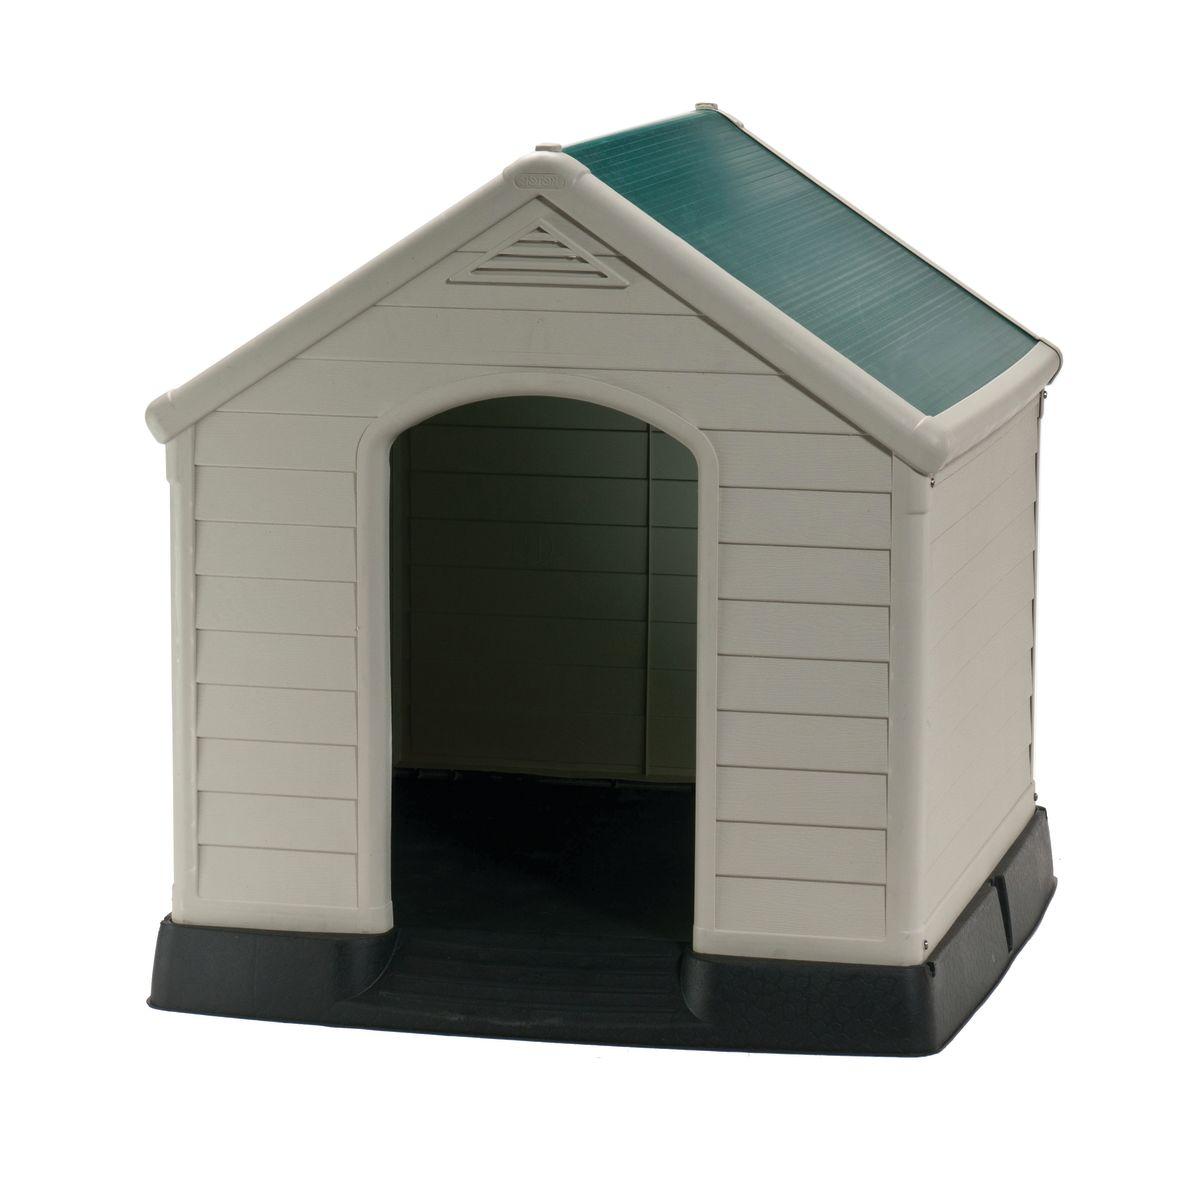 cuccia dog house: prezzi e offerte online